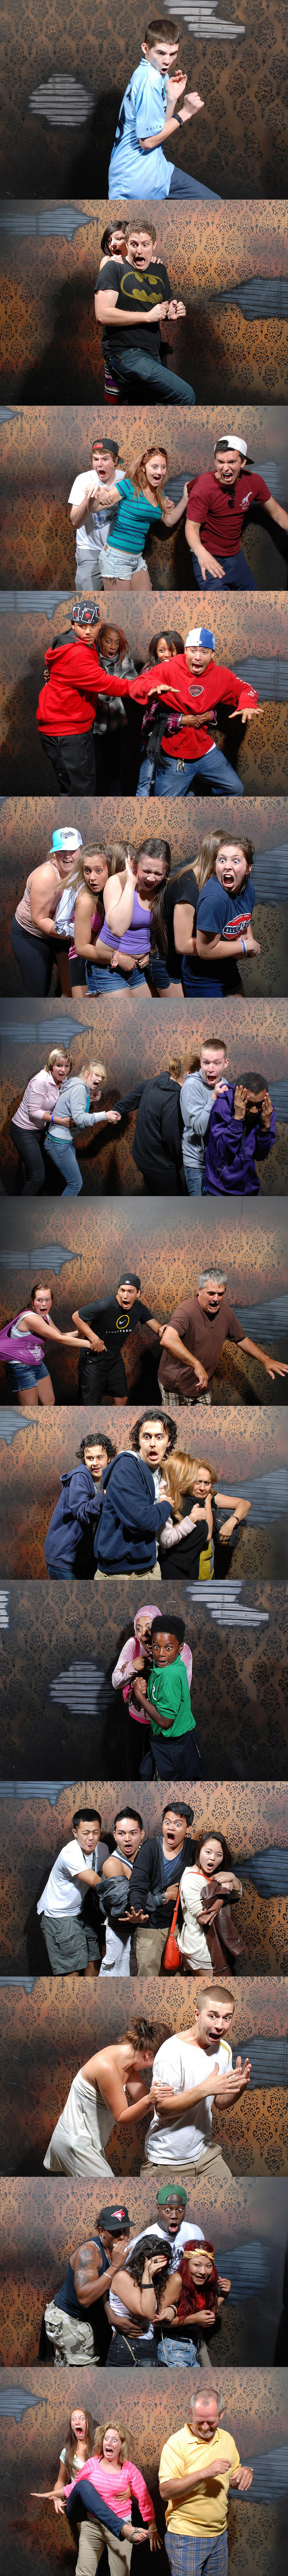 Happy Halloween. http://www.flickr.com/photos/nightmaresfearfactory/